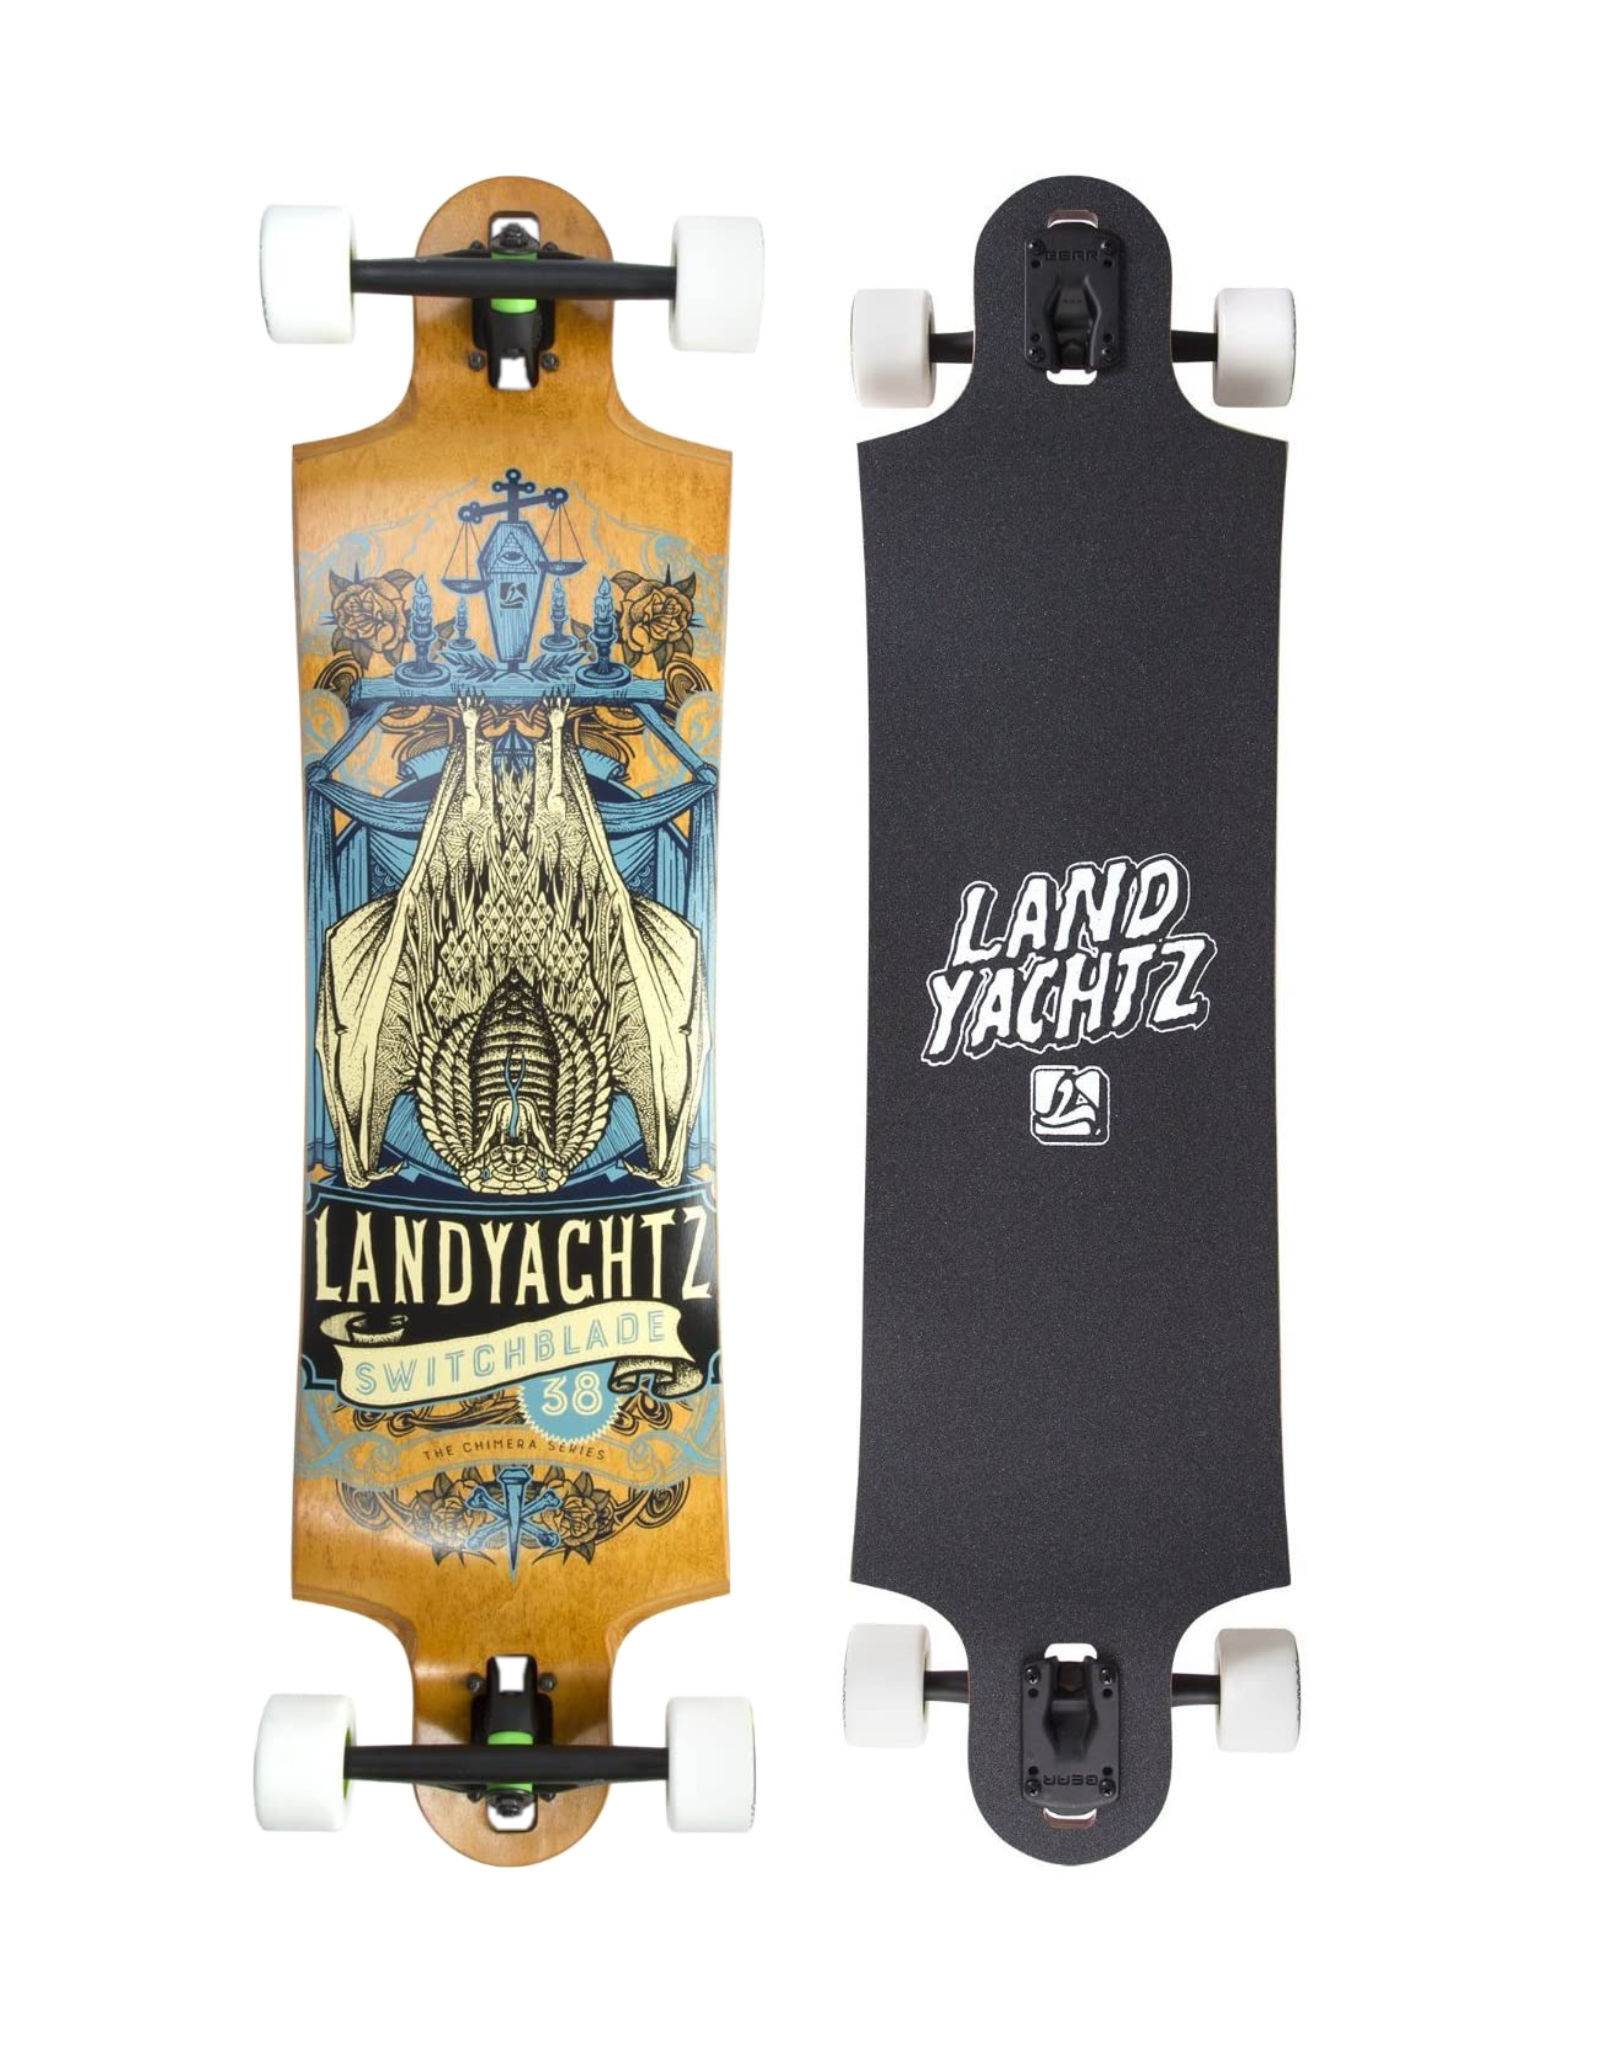 "Landyachtz Landyachtz Switchblade 38"" Maple Cobra Bat Complete"